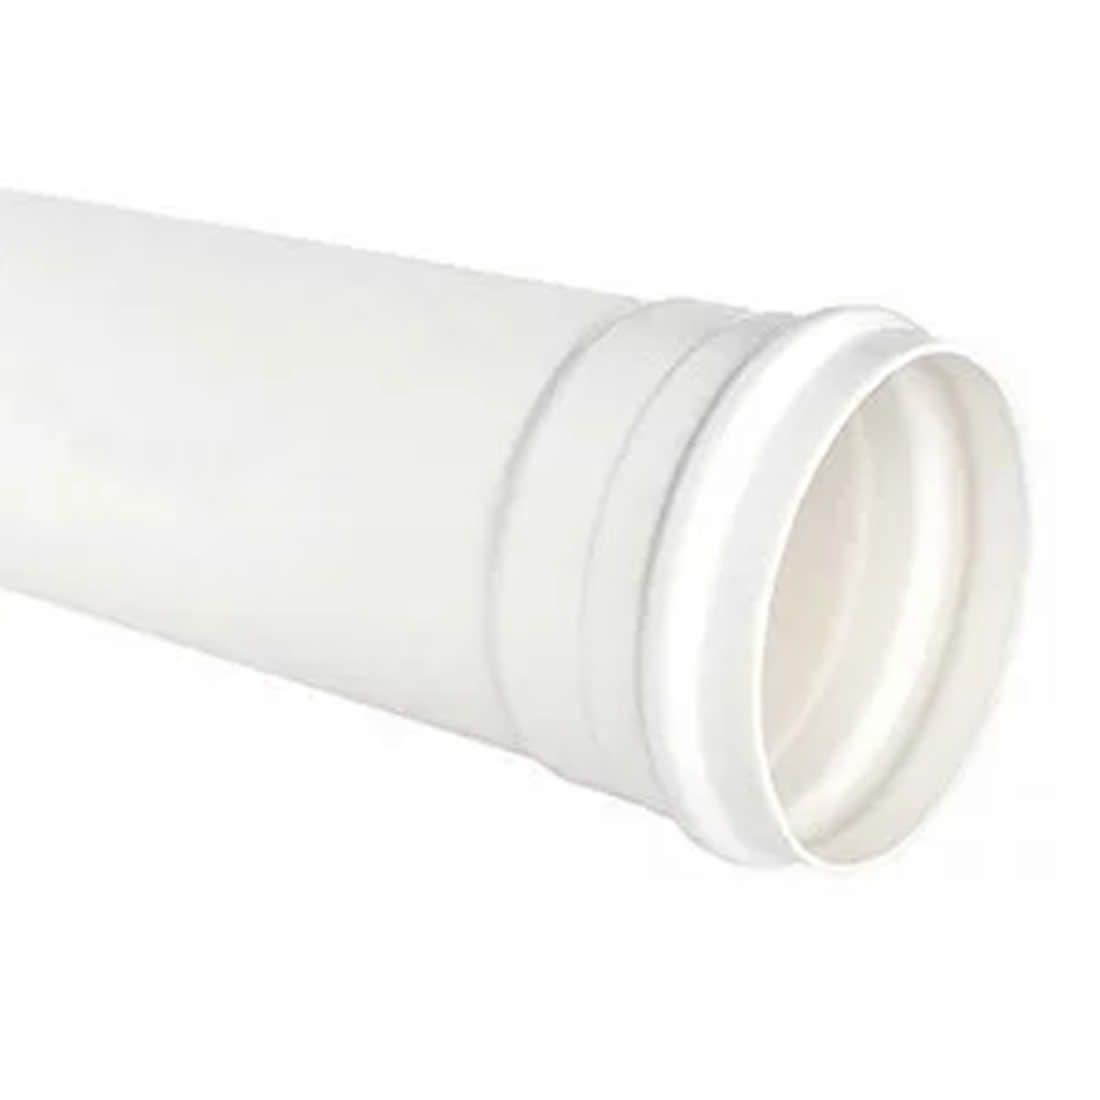 Tubo PVC Para Esgoto 250mm X 6 Metros Tigre